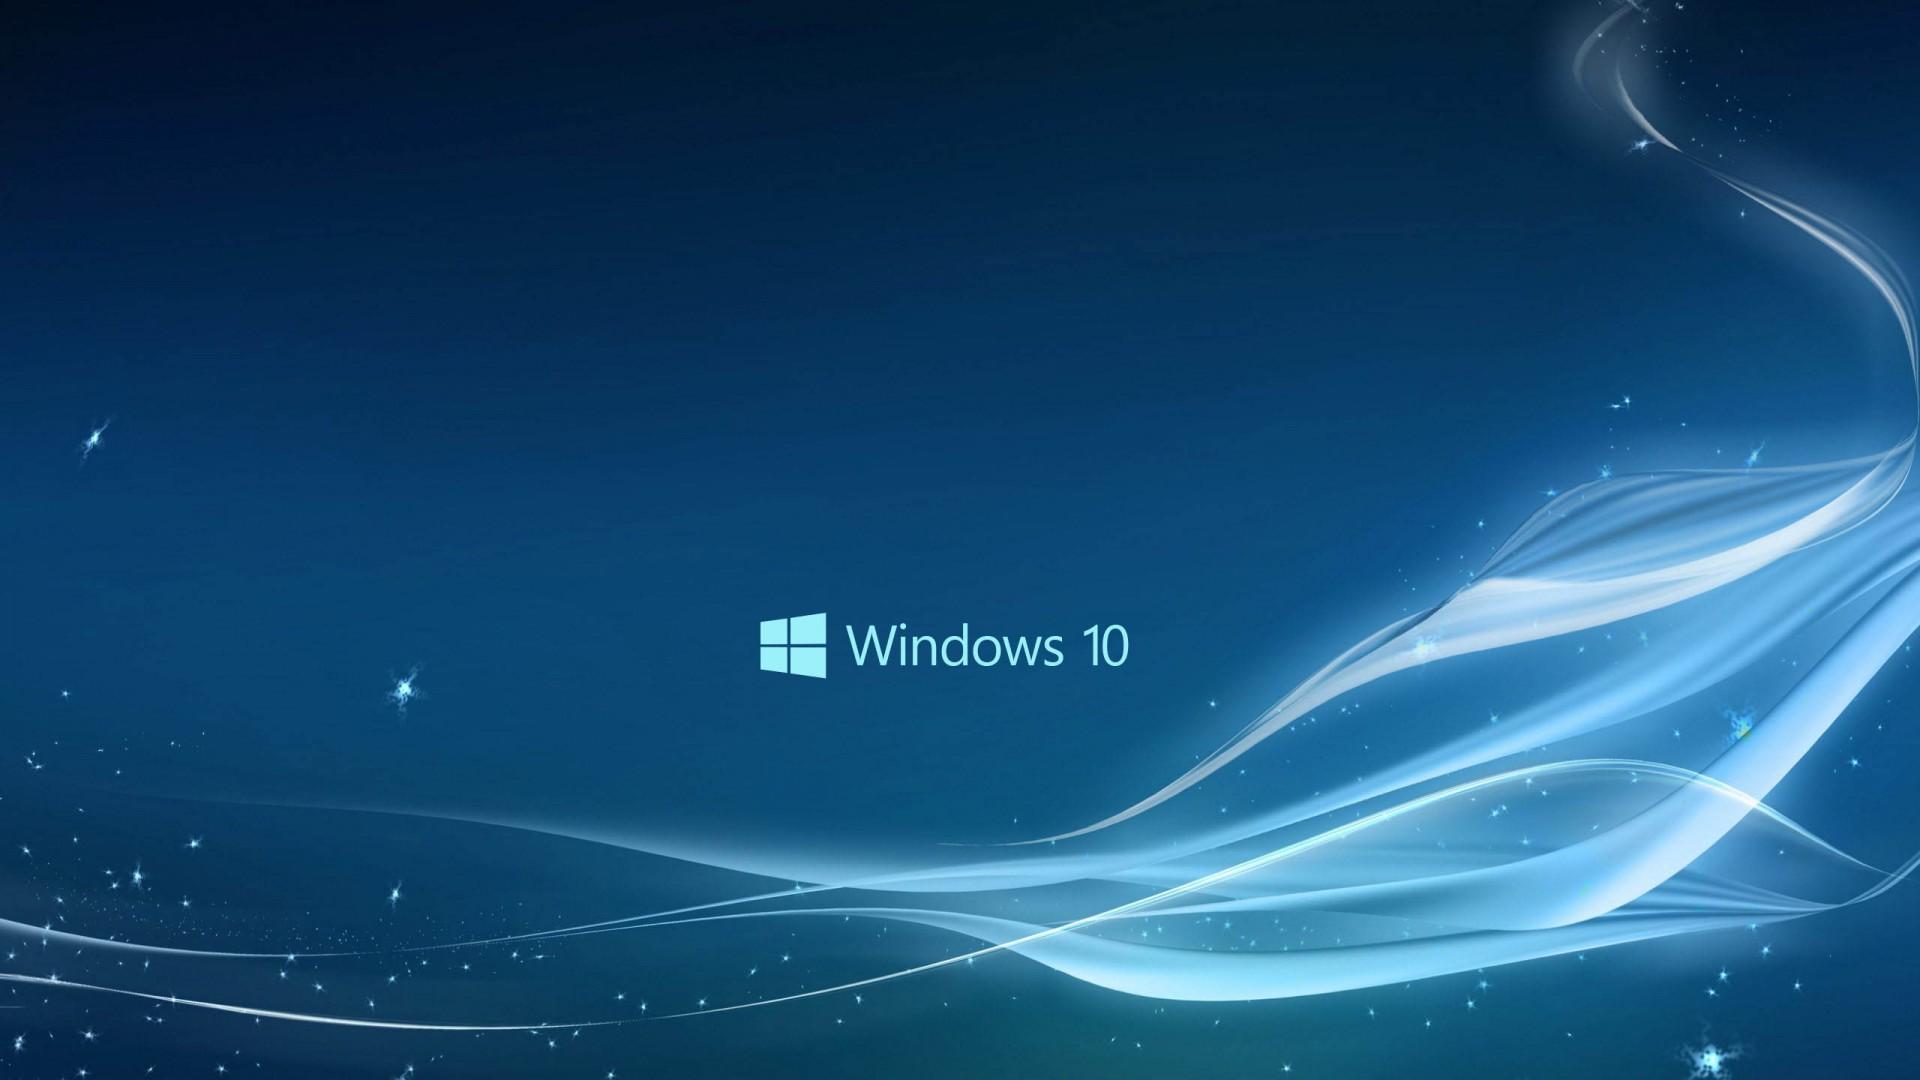 Windows 10 HD wallpaper 2015 1920x1080 1080p   Wallpaper   Wallpaper 1920x1080